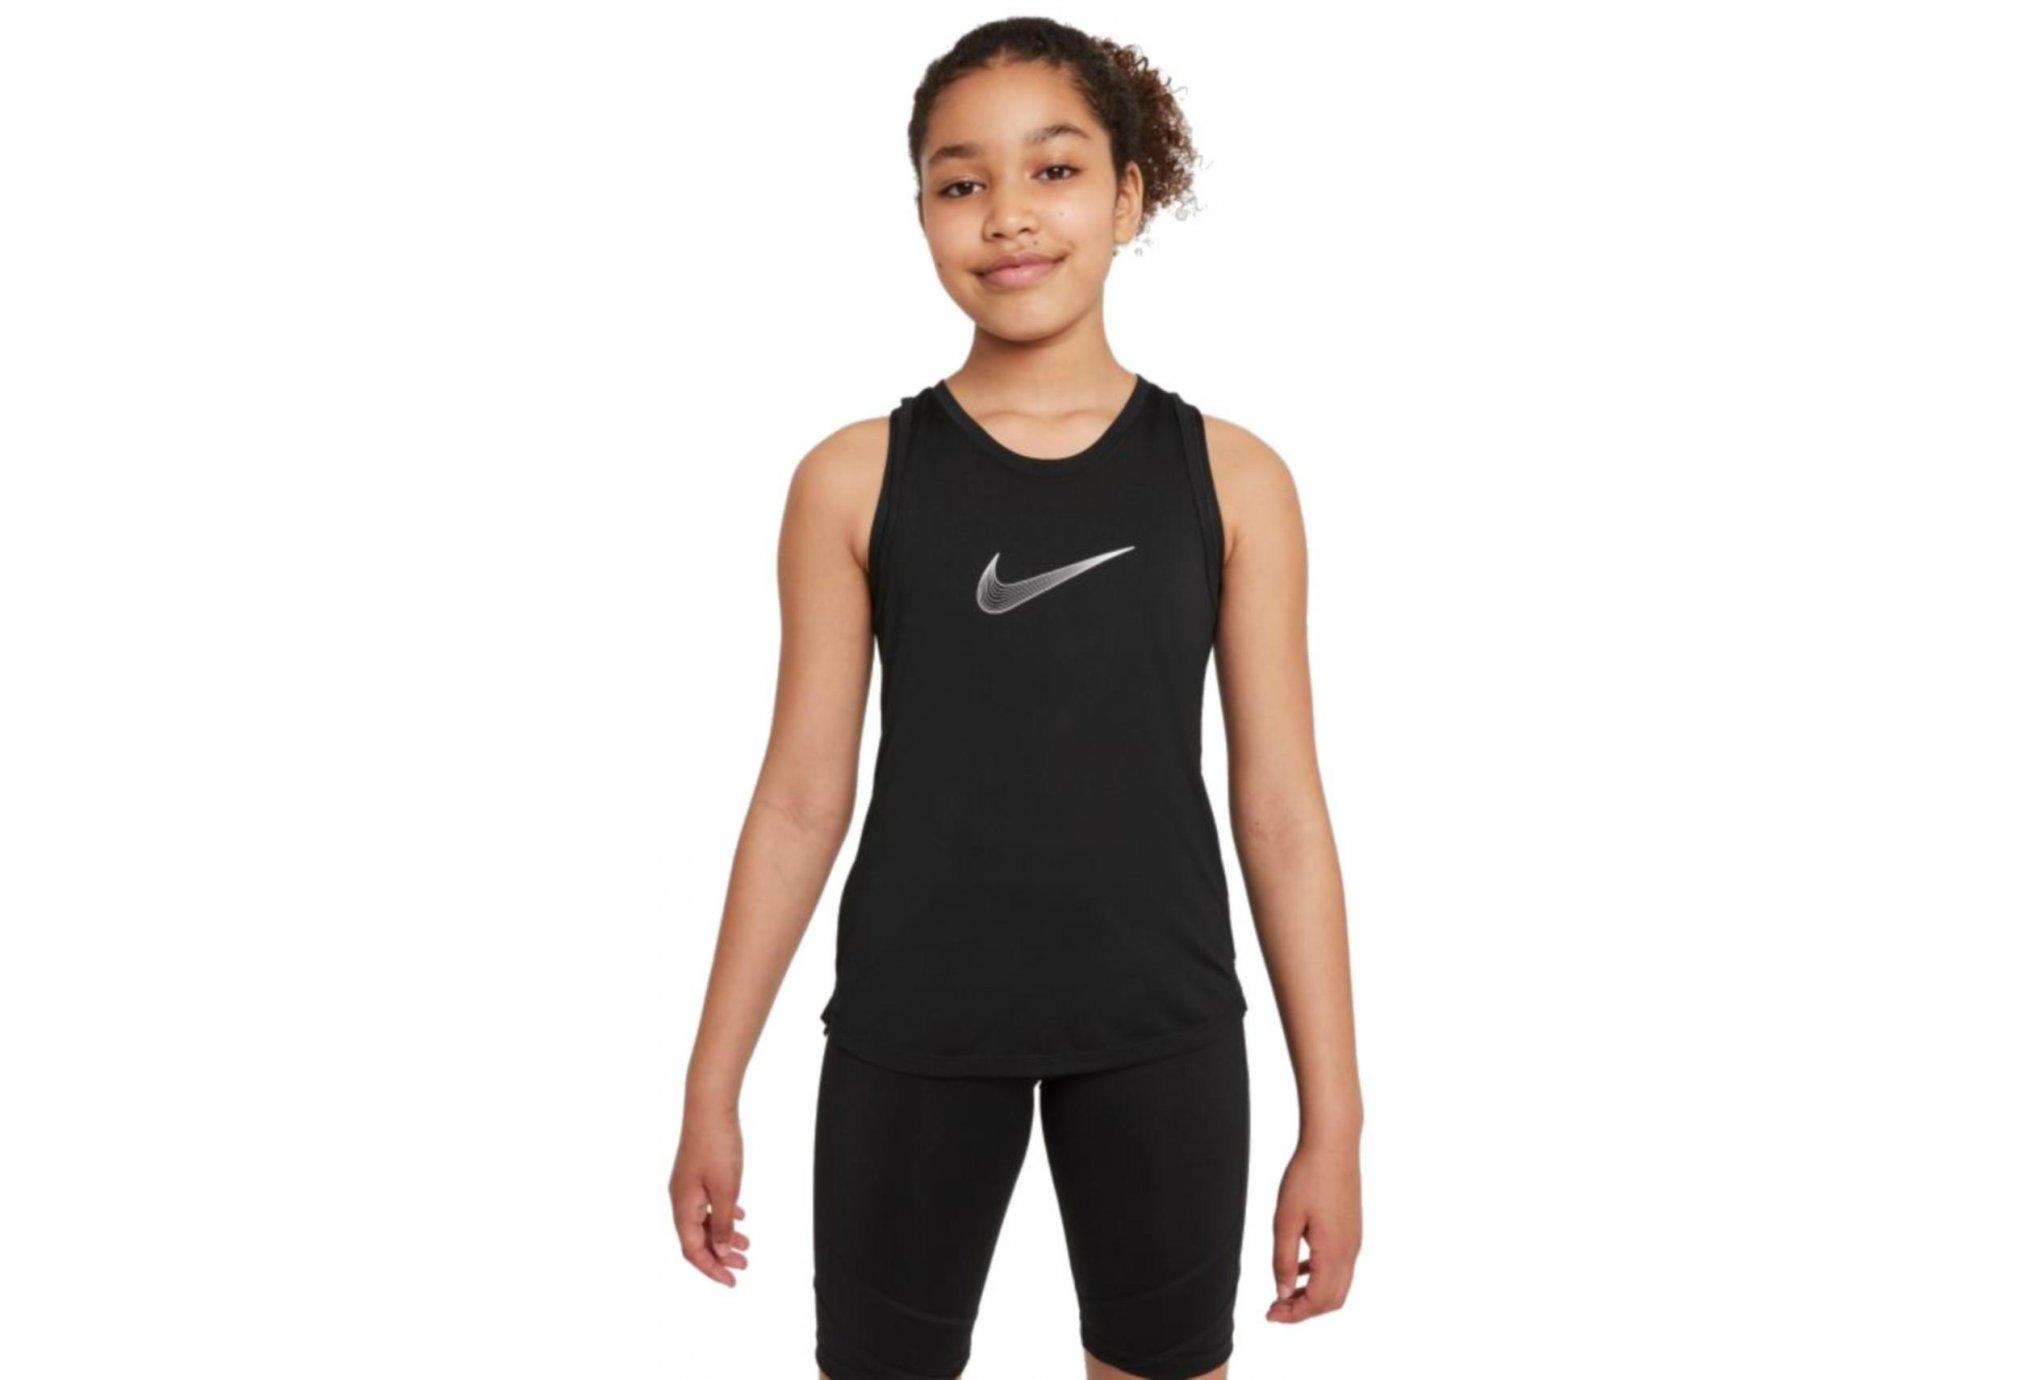 Nike Dri-Fit One Fille vêtement running femme